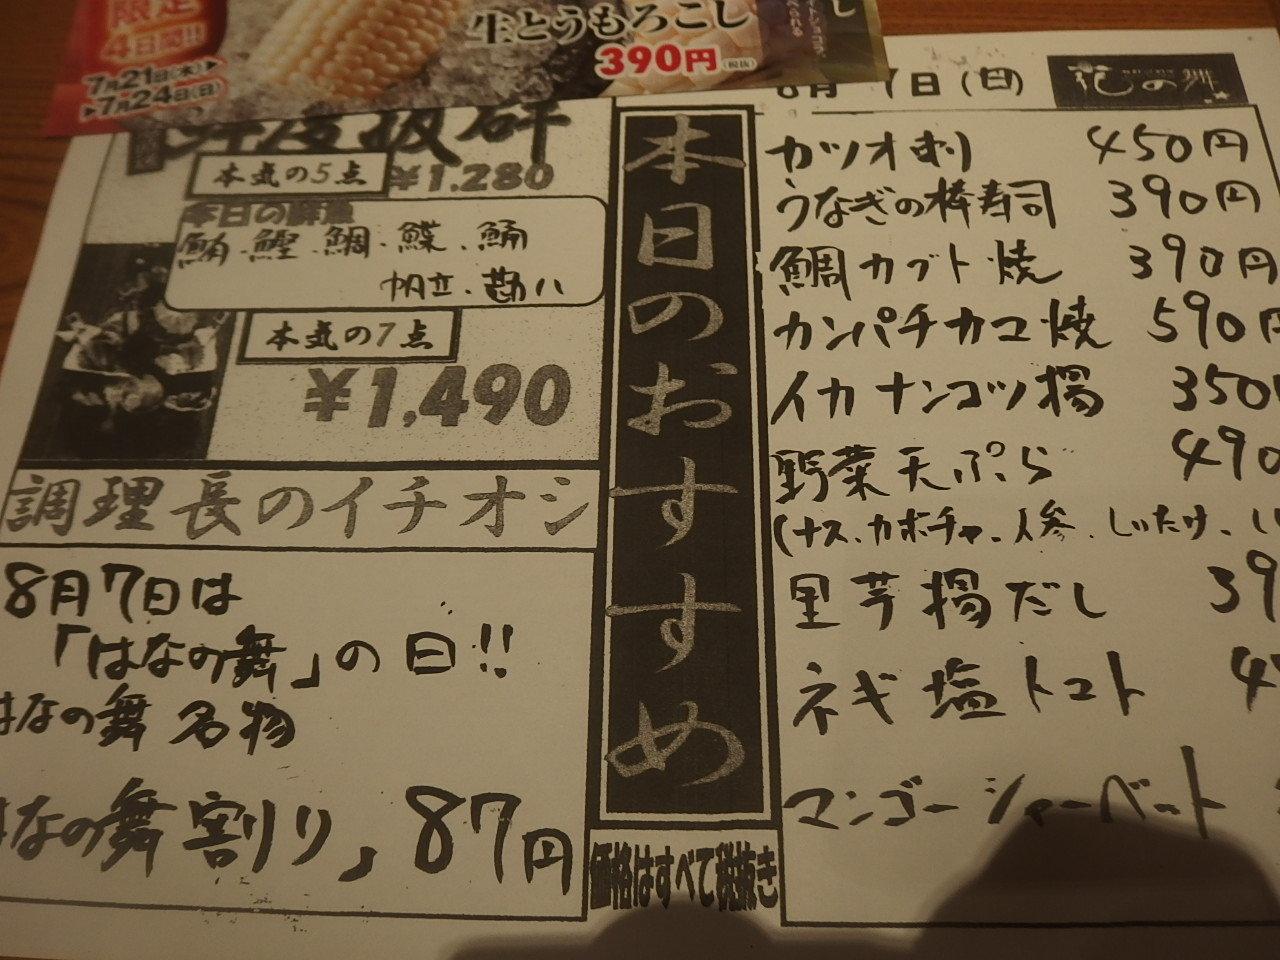 花の舞 北仙台駅前店